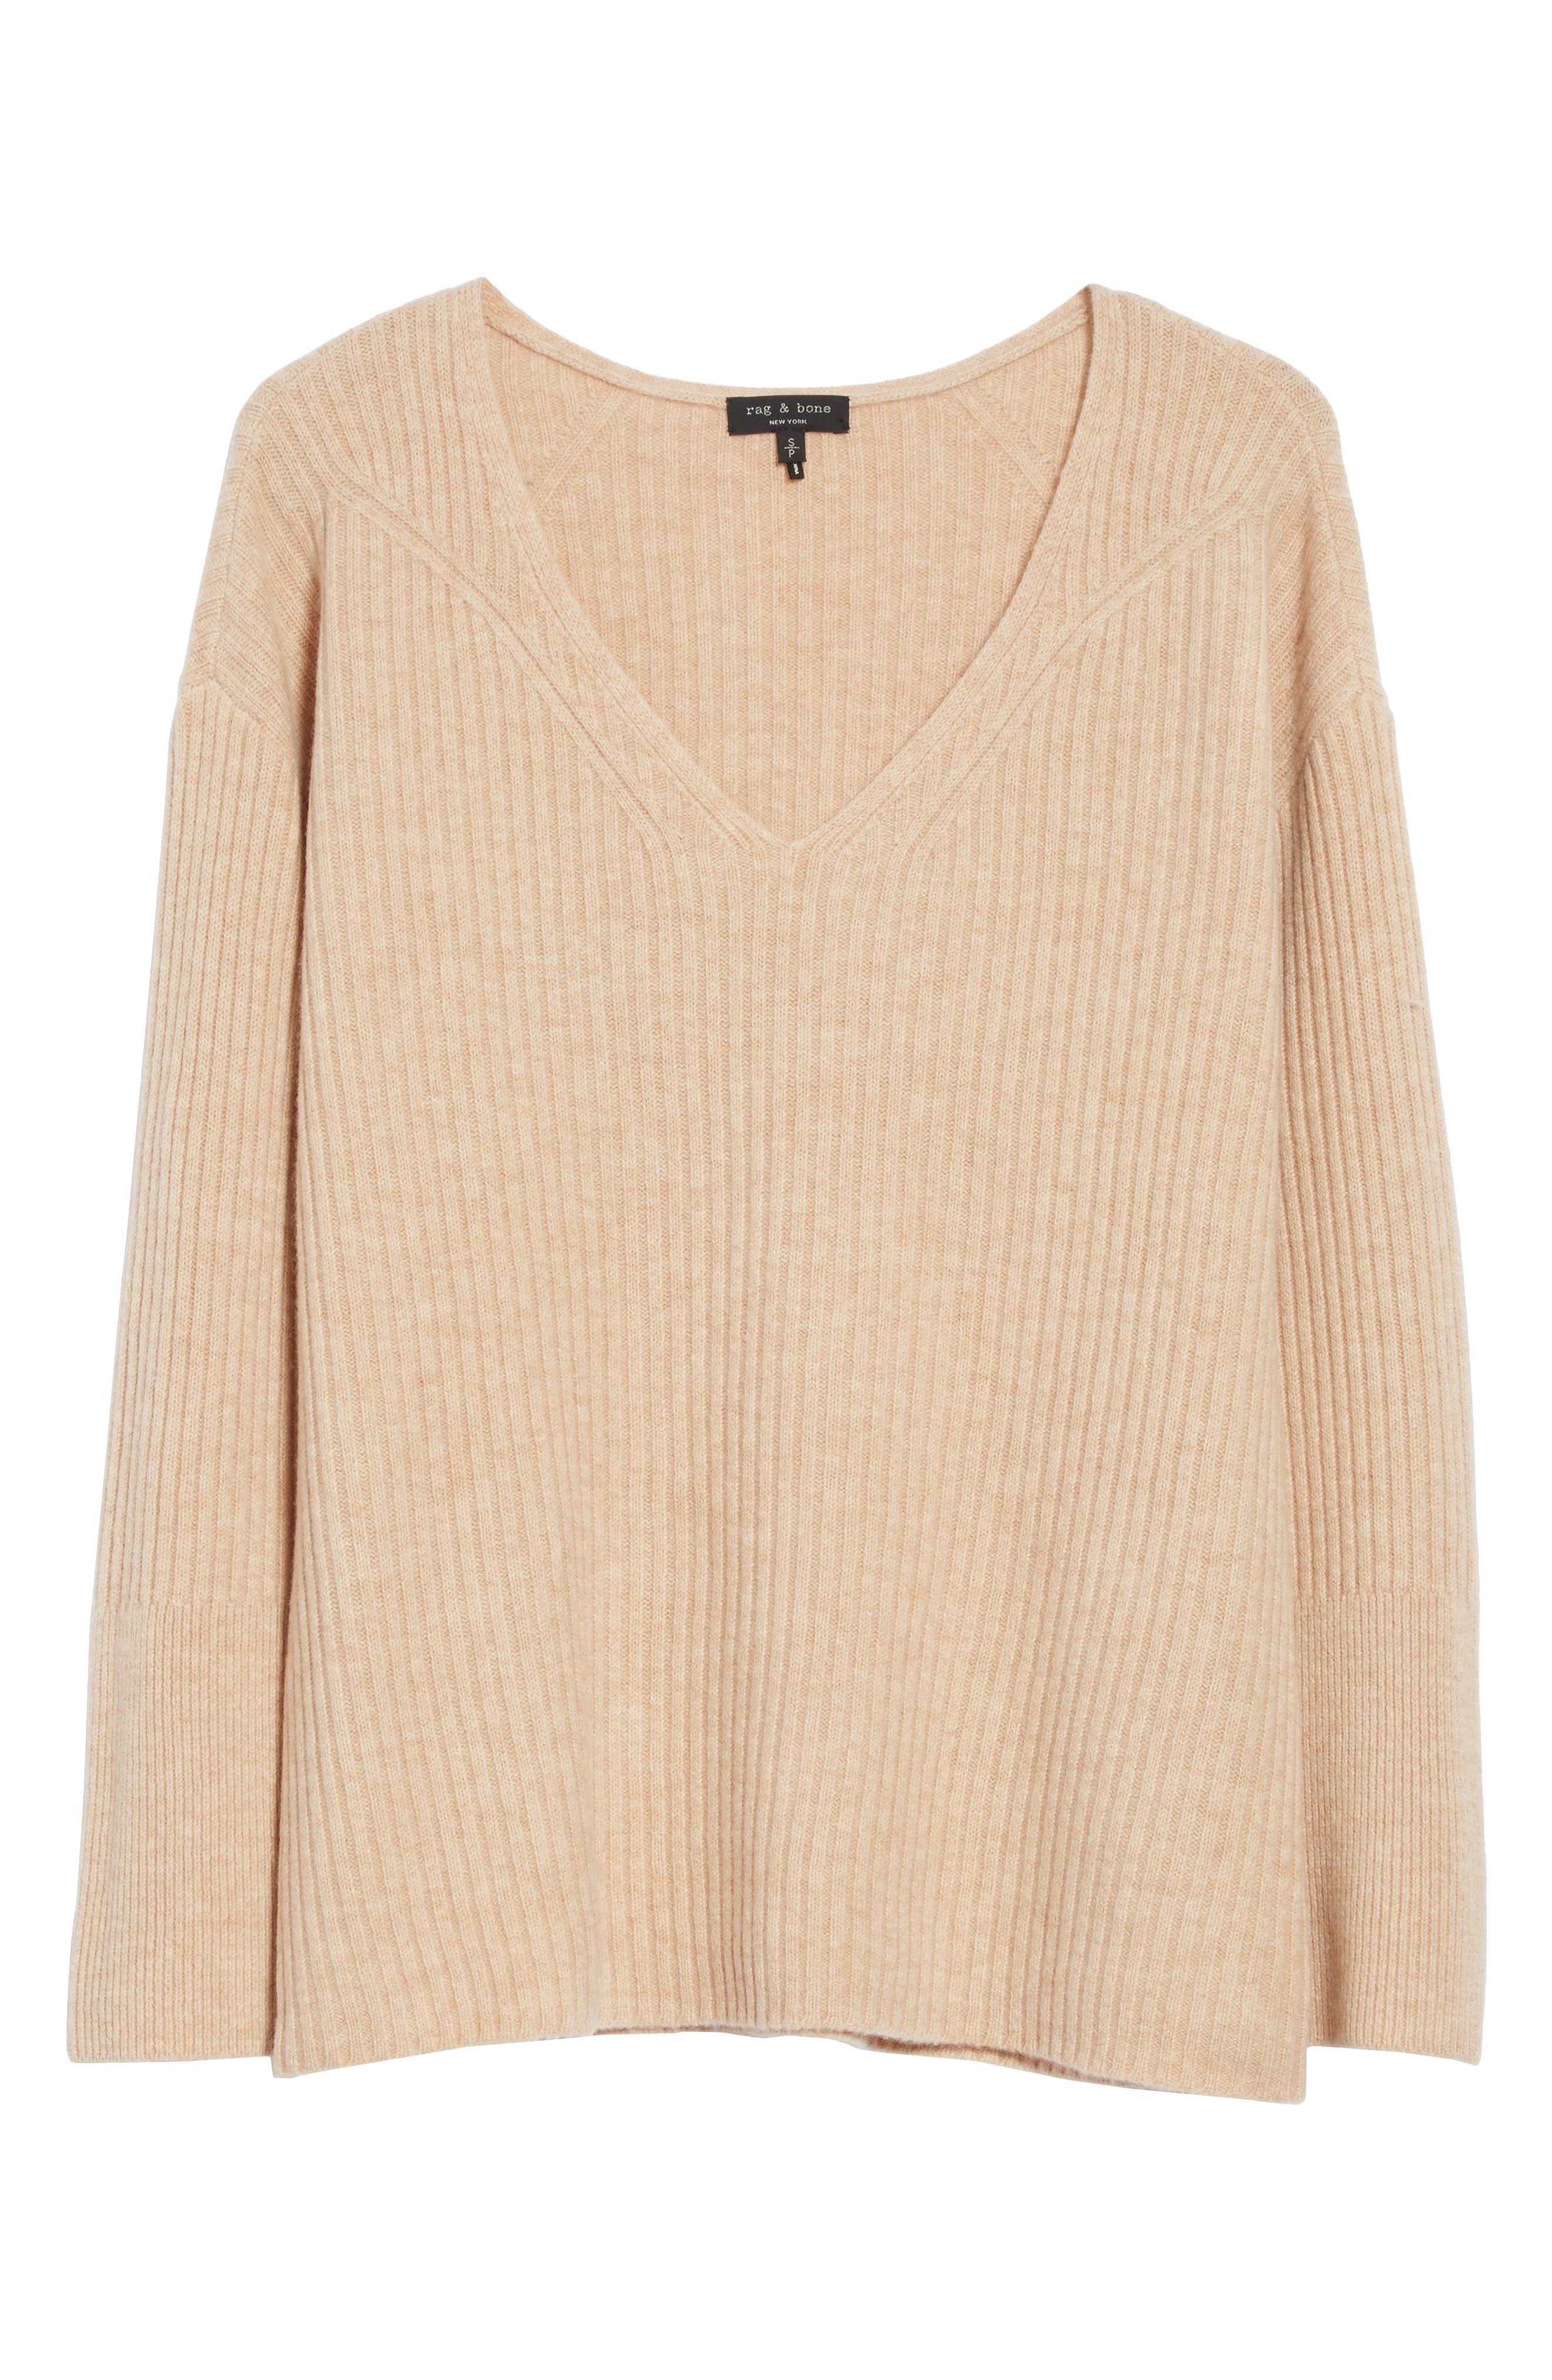 Mitchell Merino Wool Sweater,                             Alternate thumbnail 6, color,